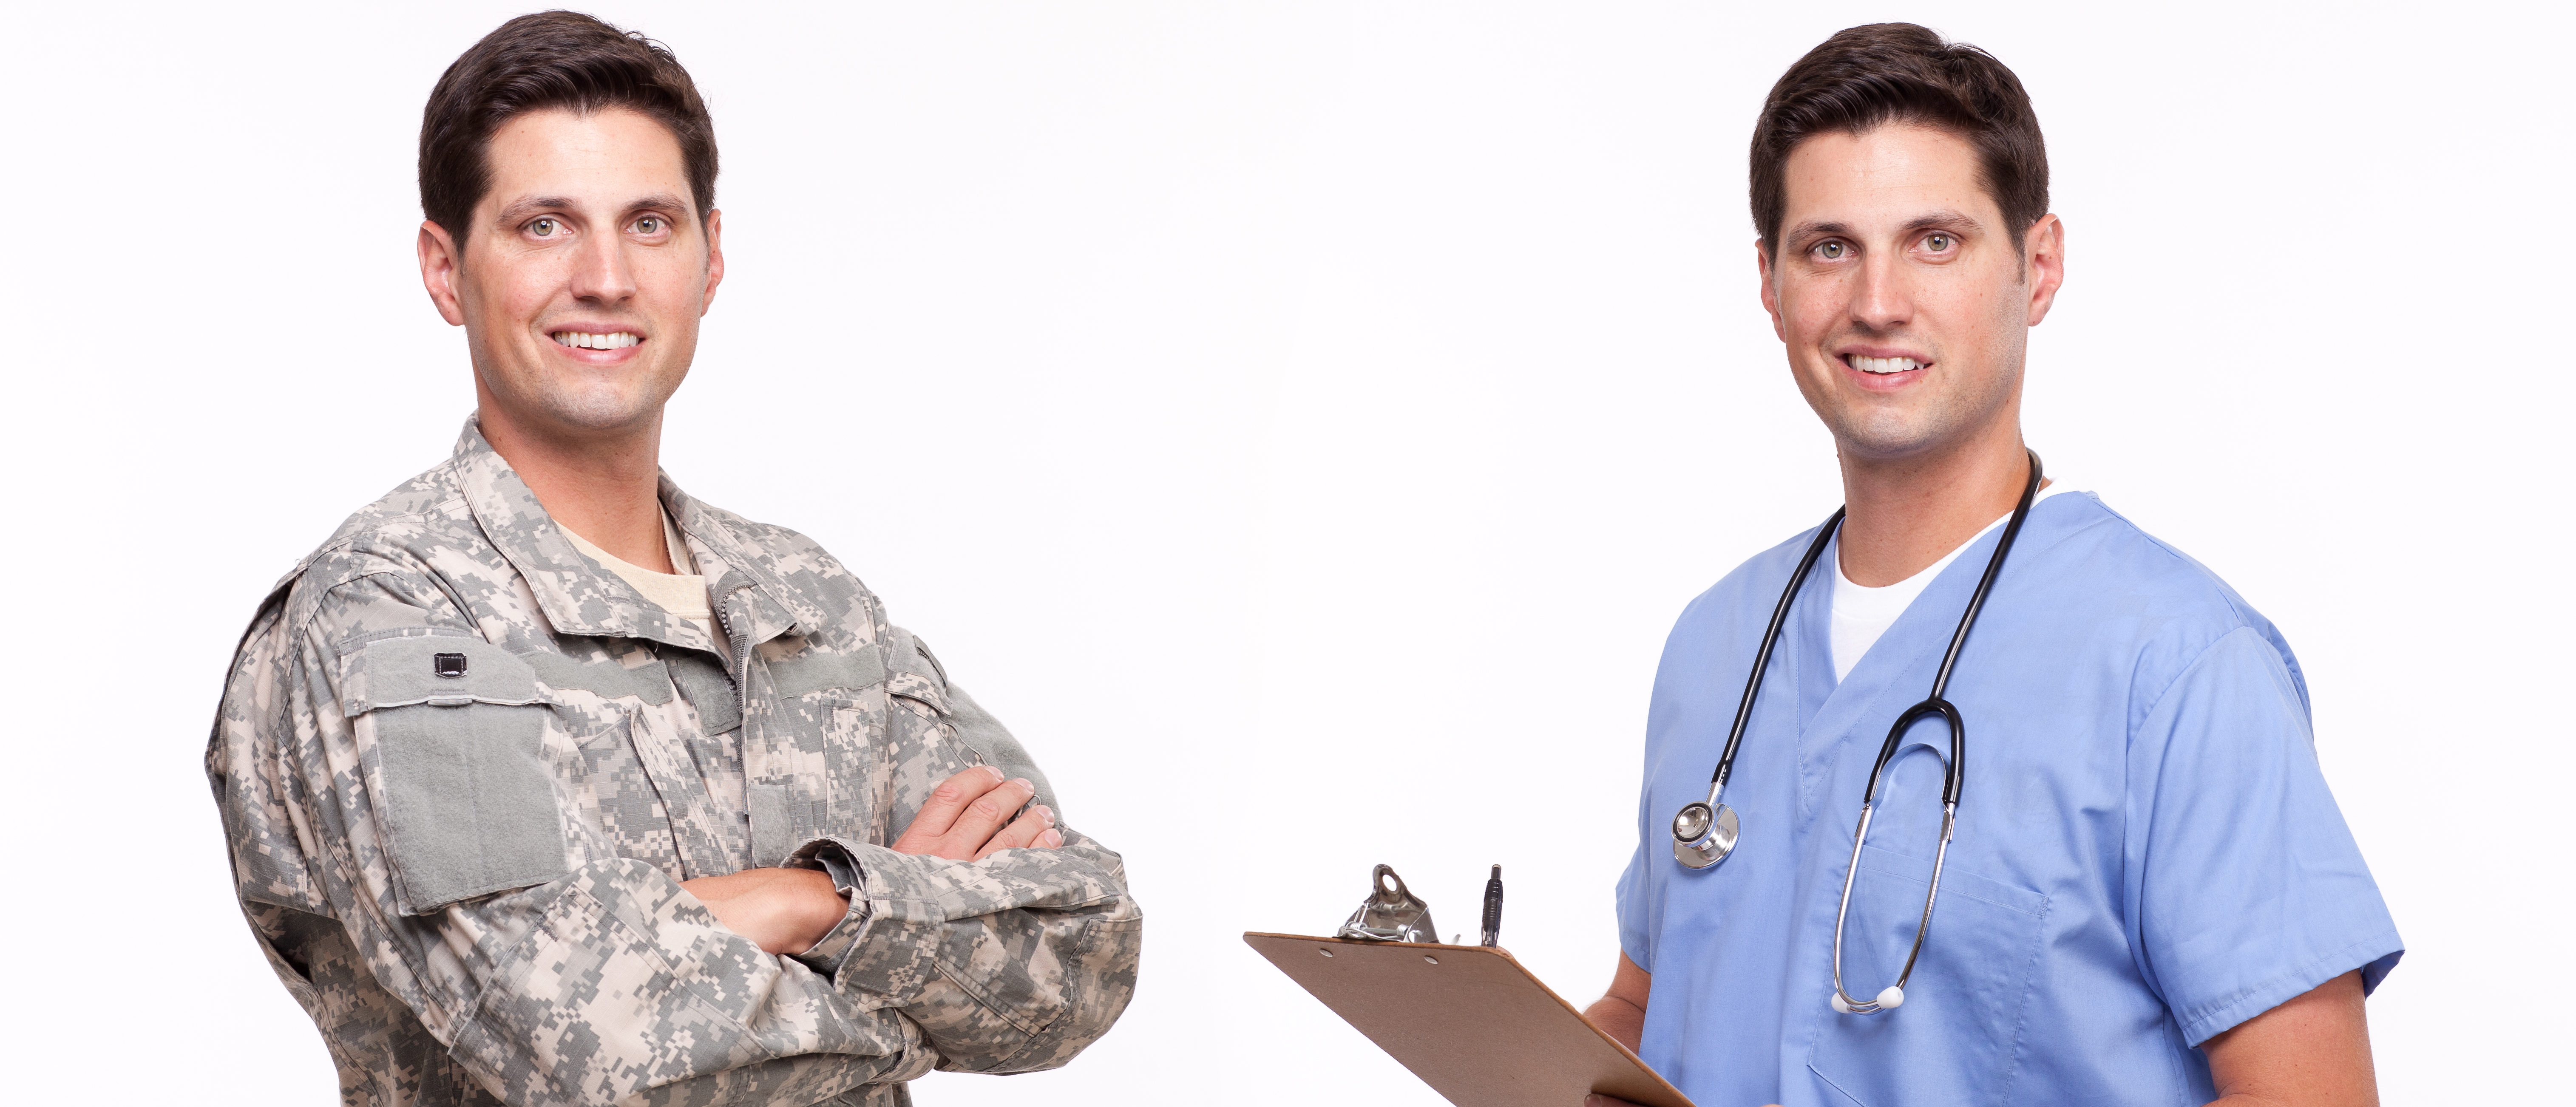 Google Announces New Tools To Help Veterans Transition Into Civilian Jobs